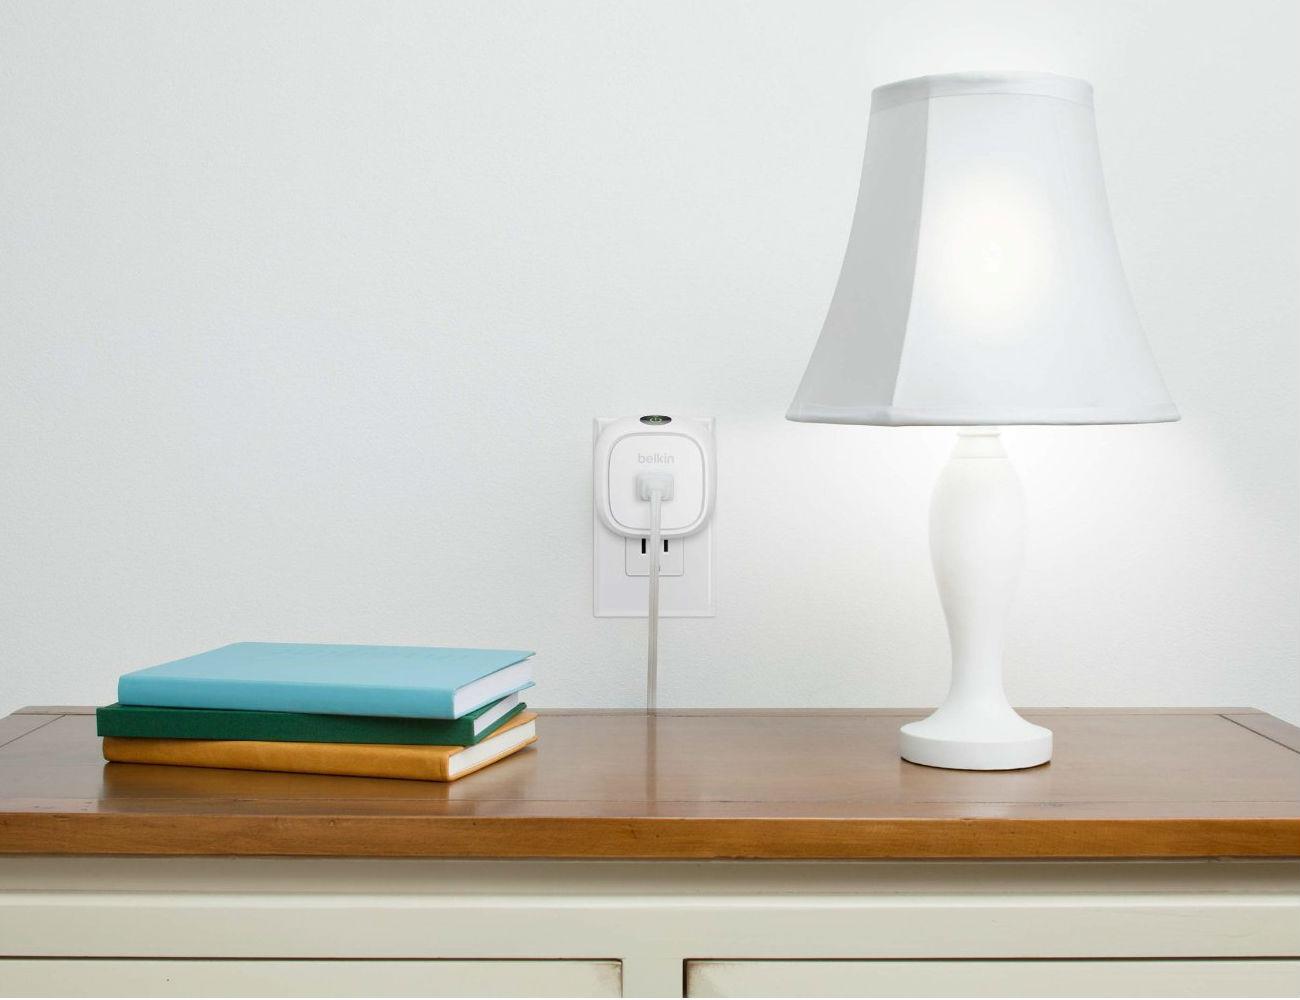 Belkin Wemo Home Automation Switch & Motion Sensor